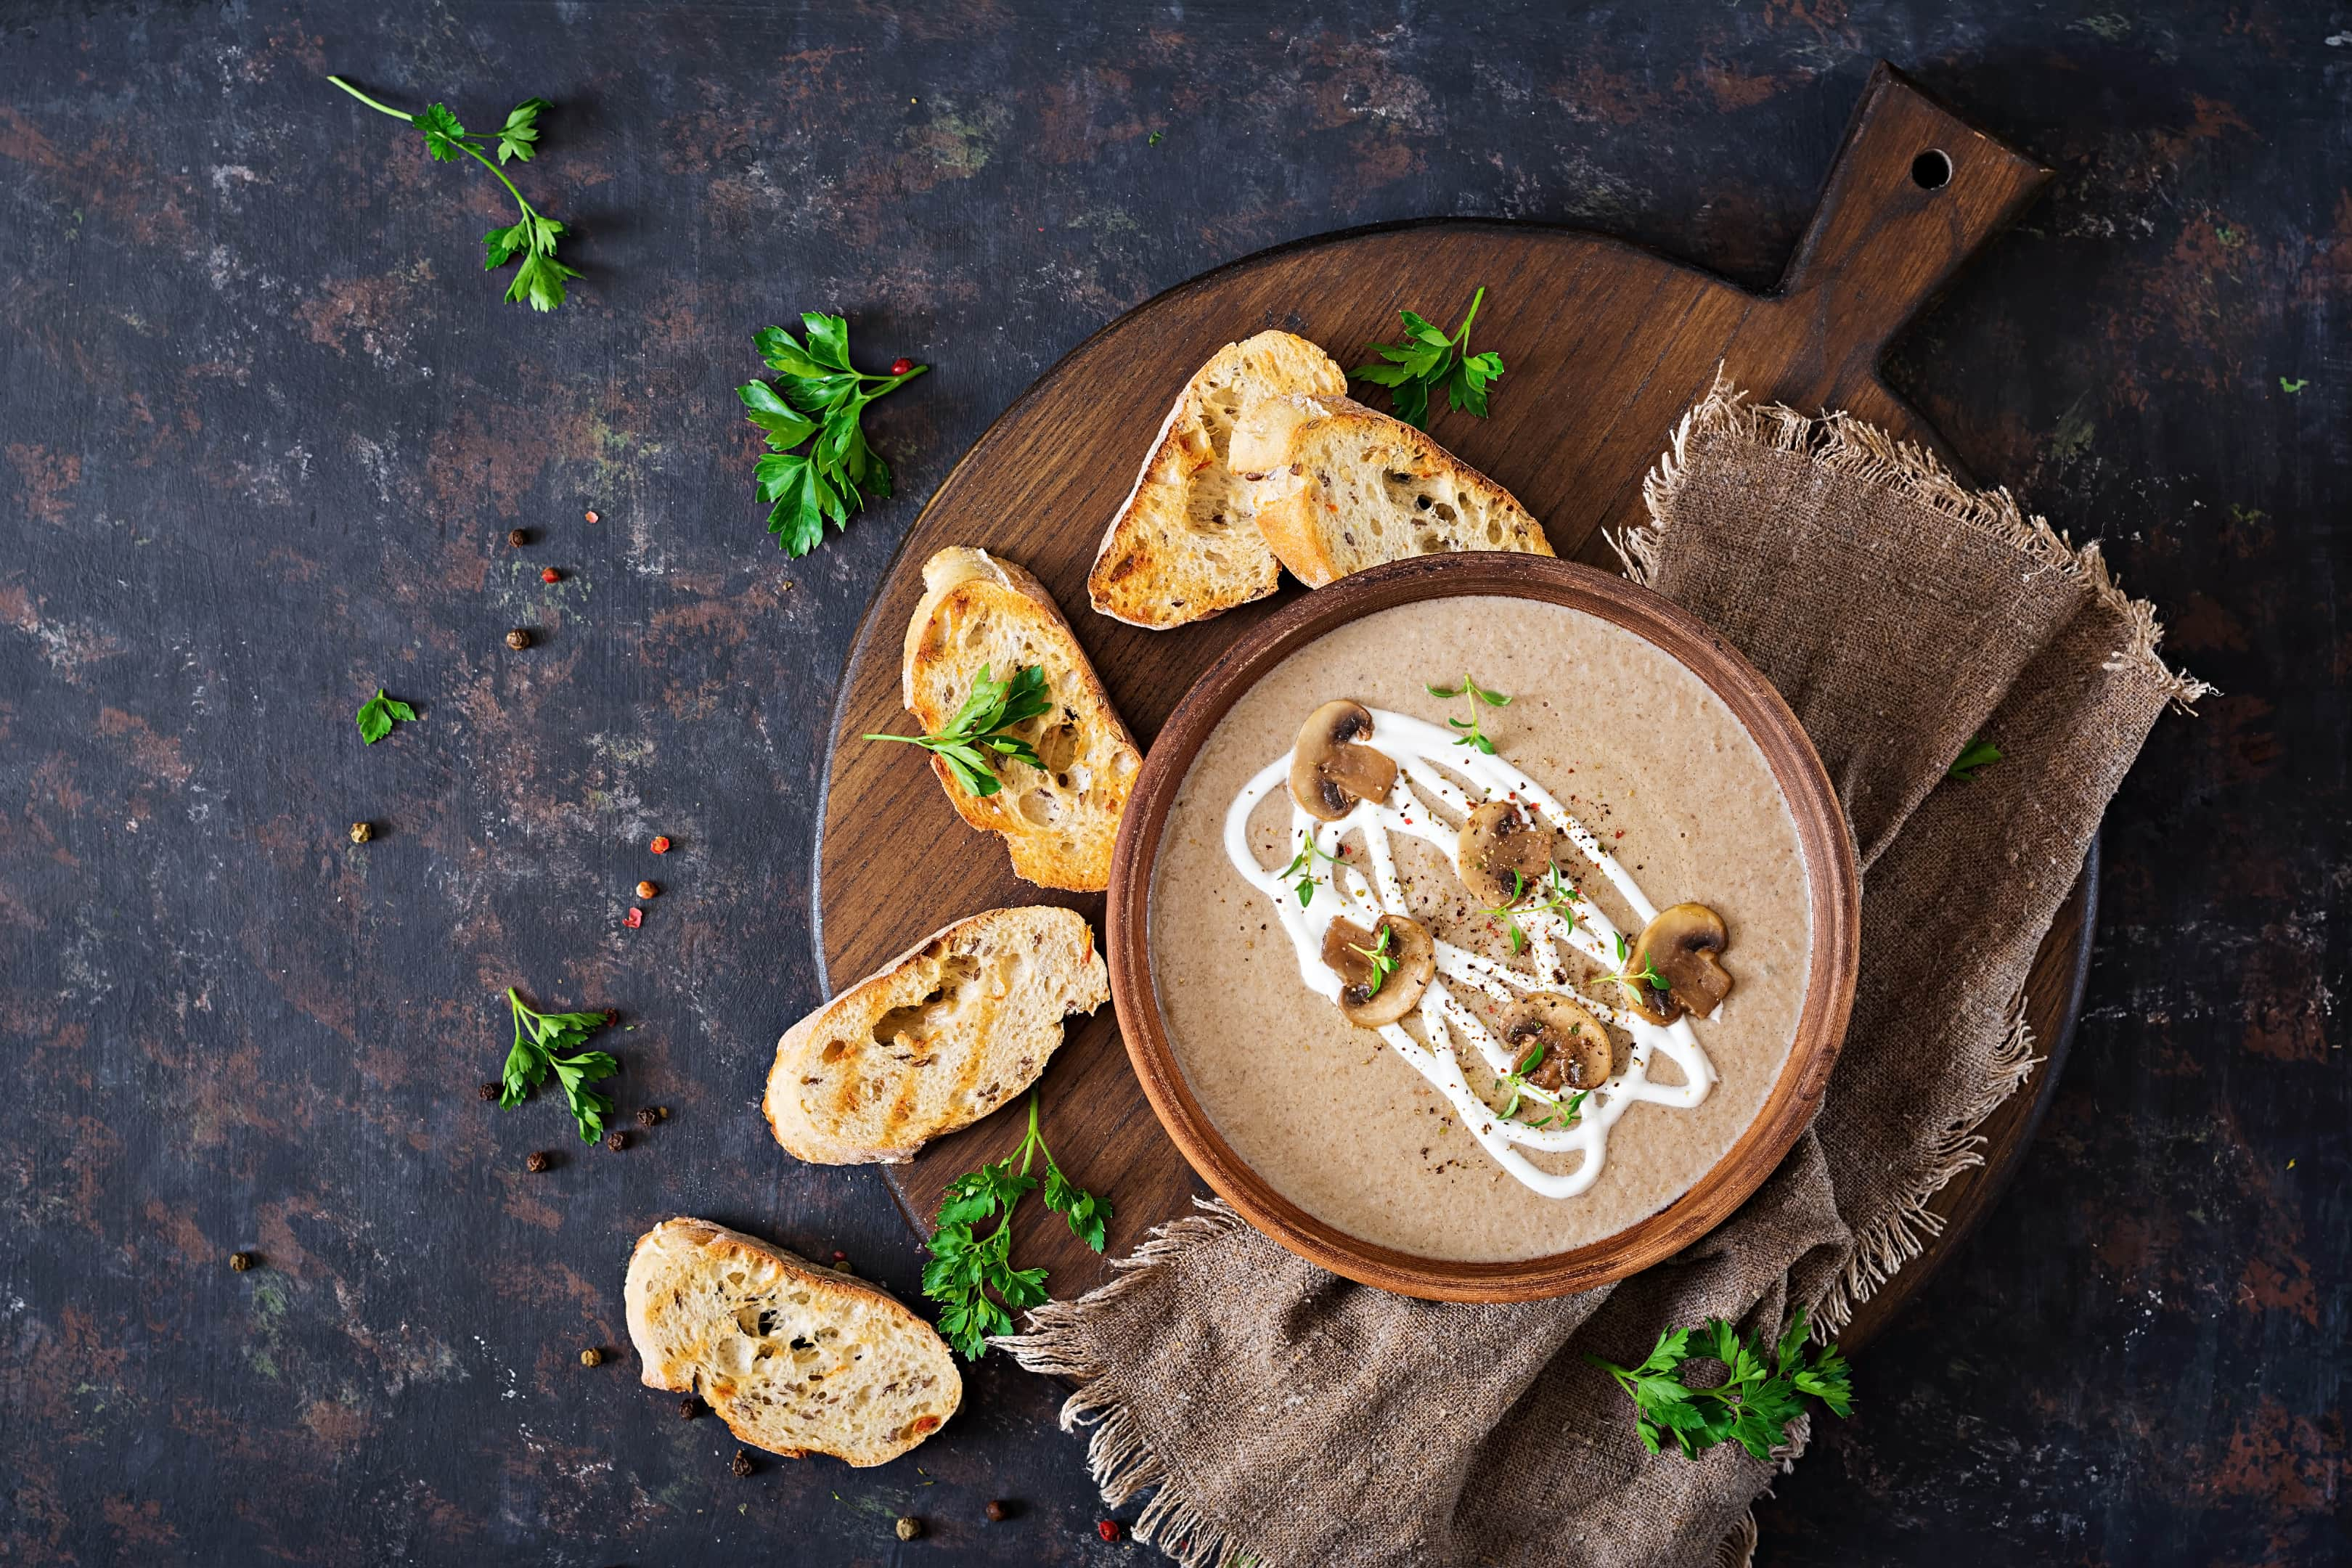 Mushroom cream puree in ceramic bowl on wooden board